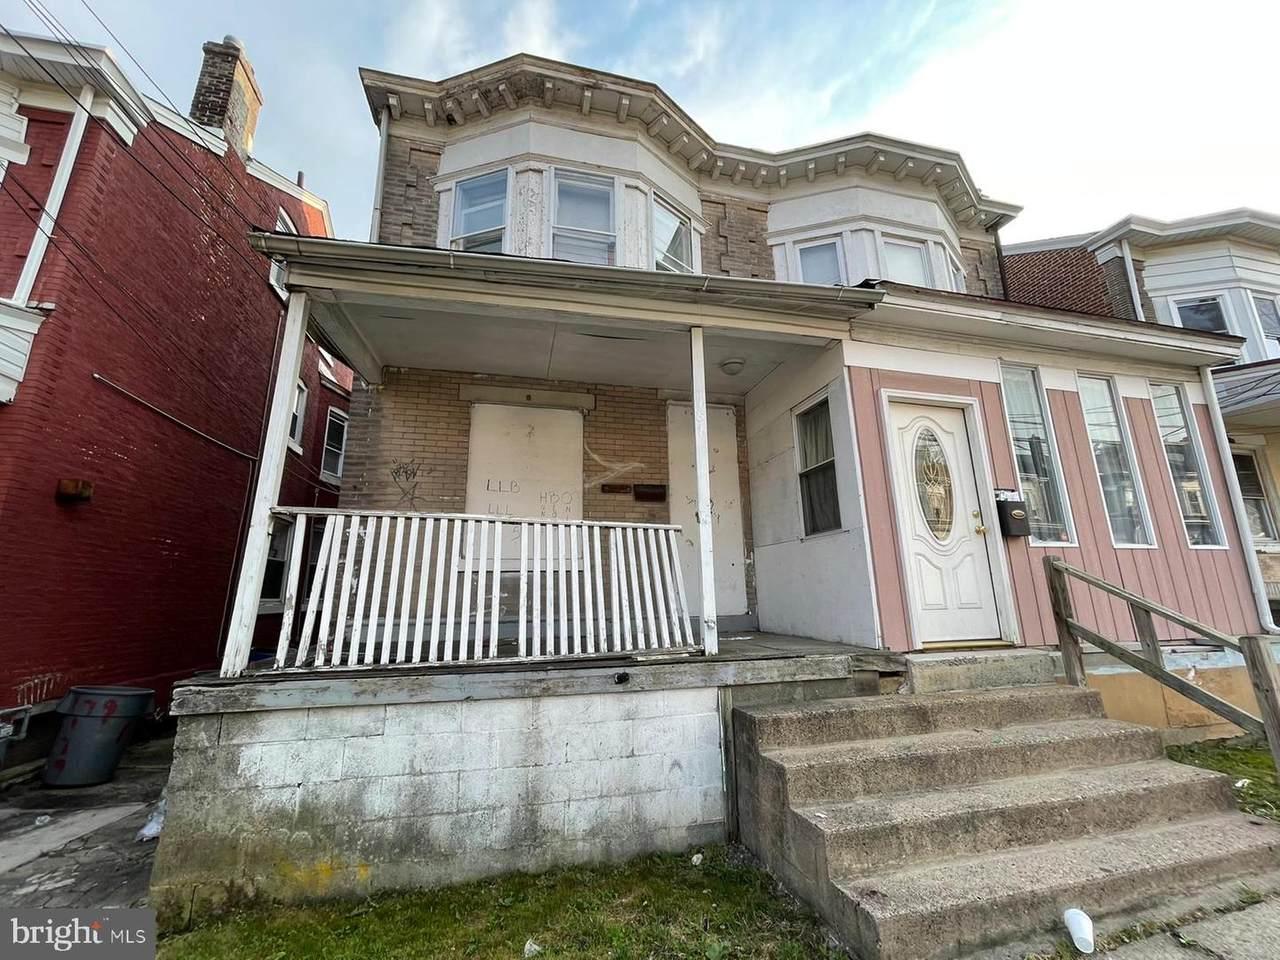 181 Rosemont Ave - Photo 1